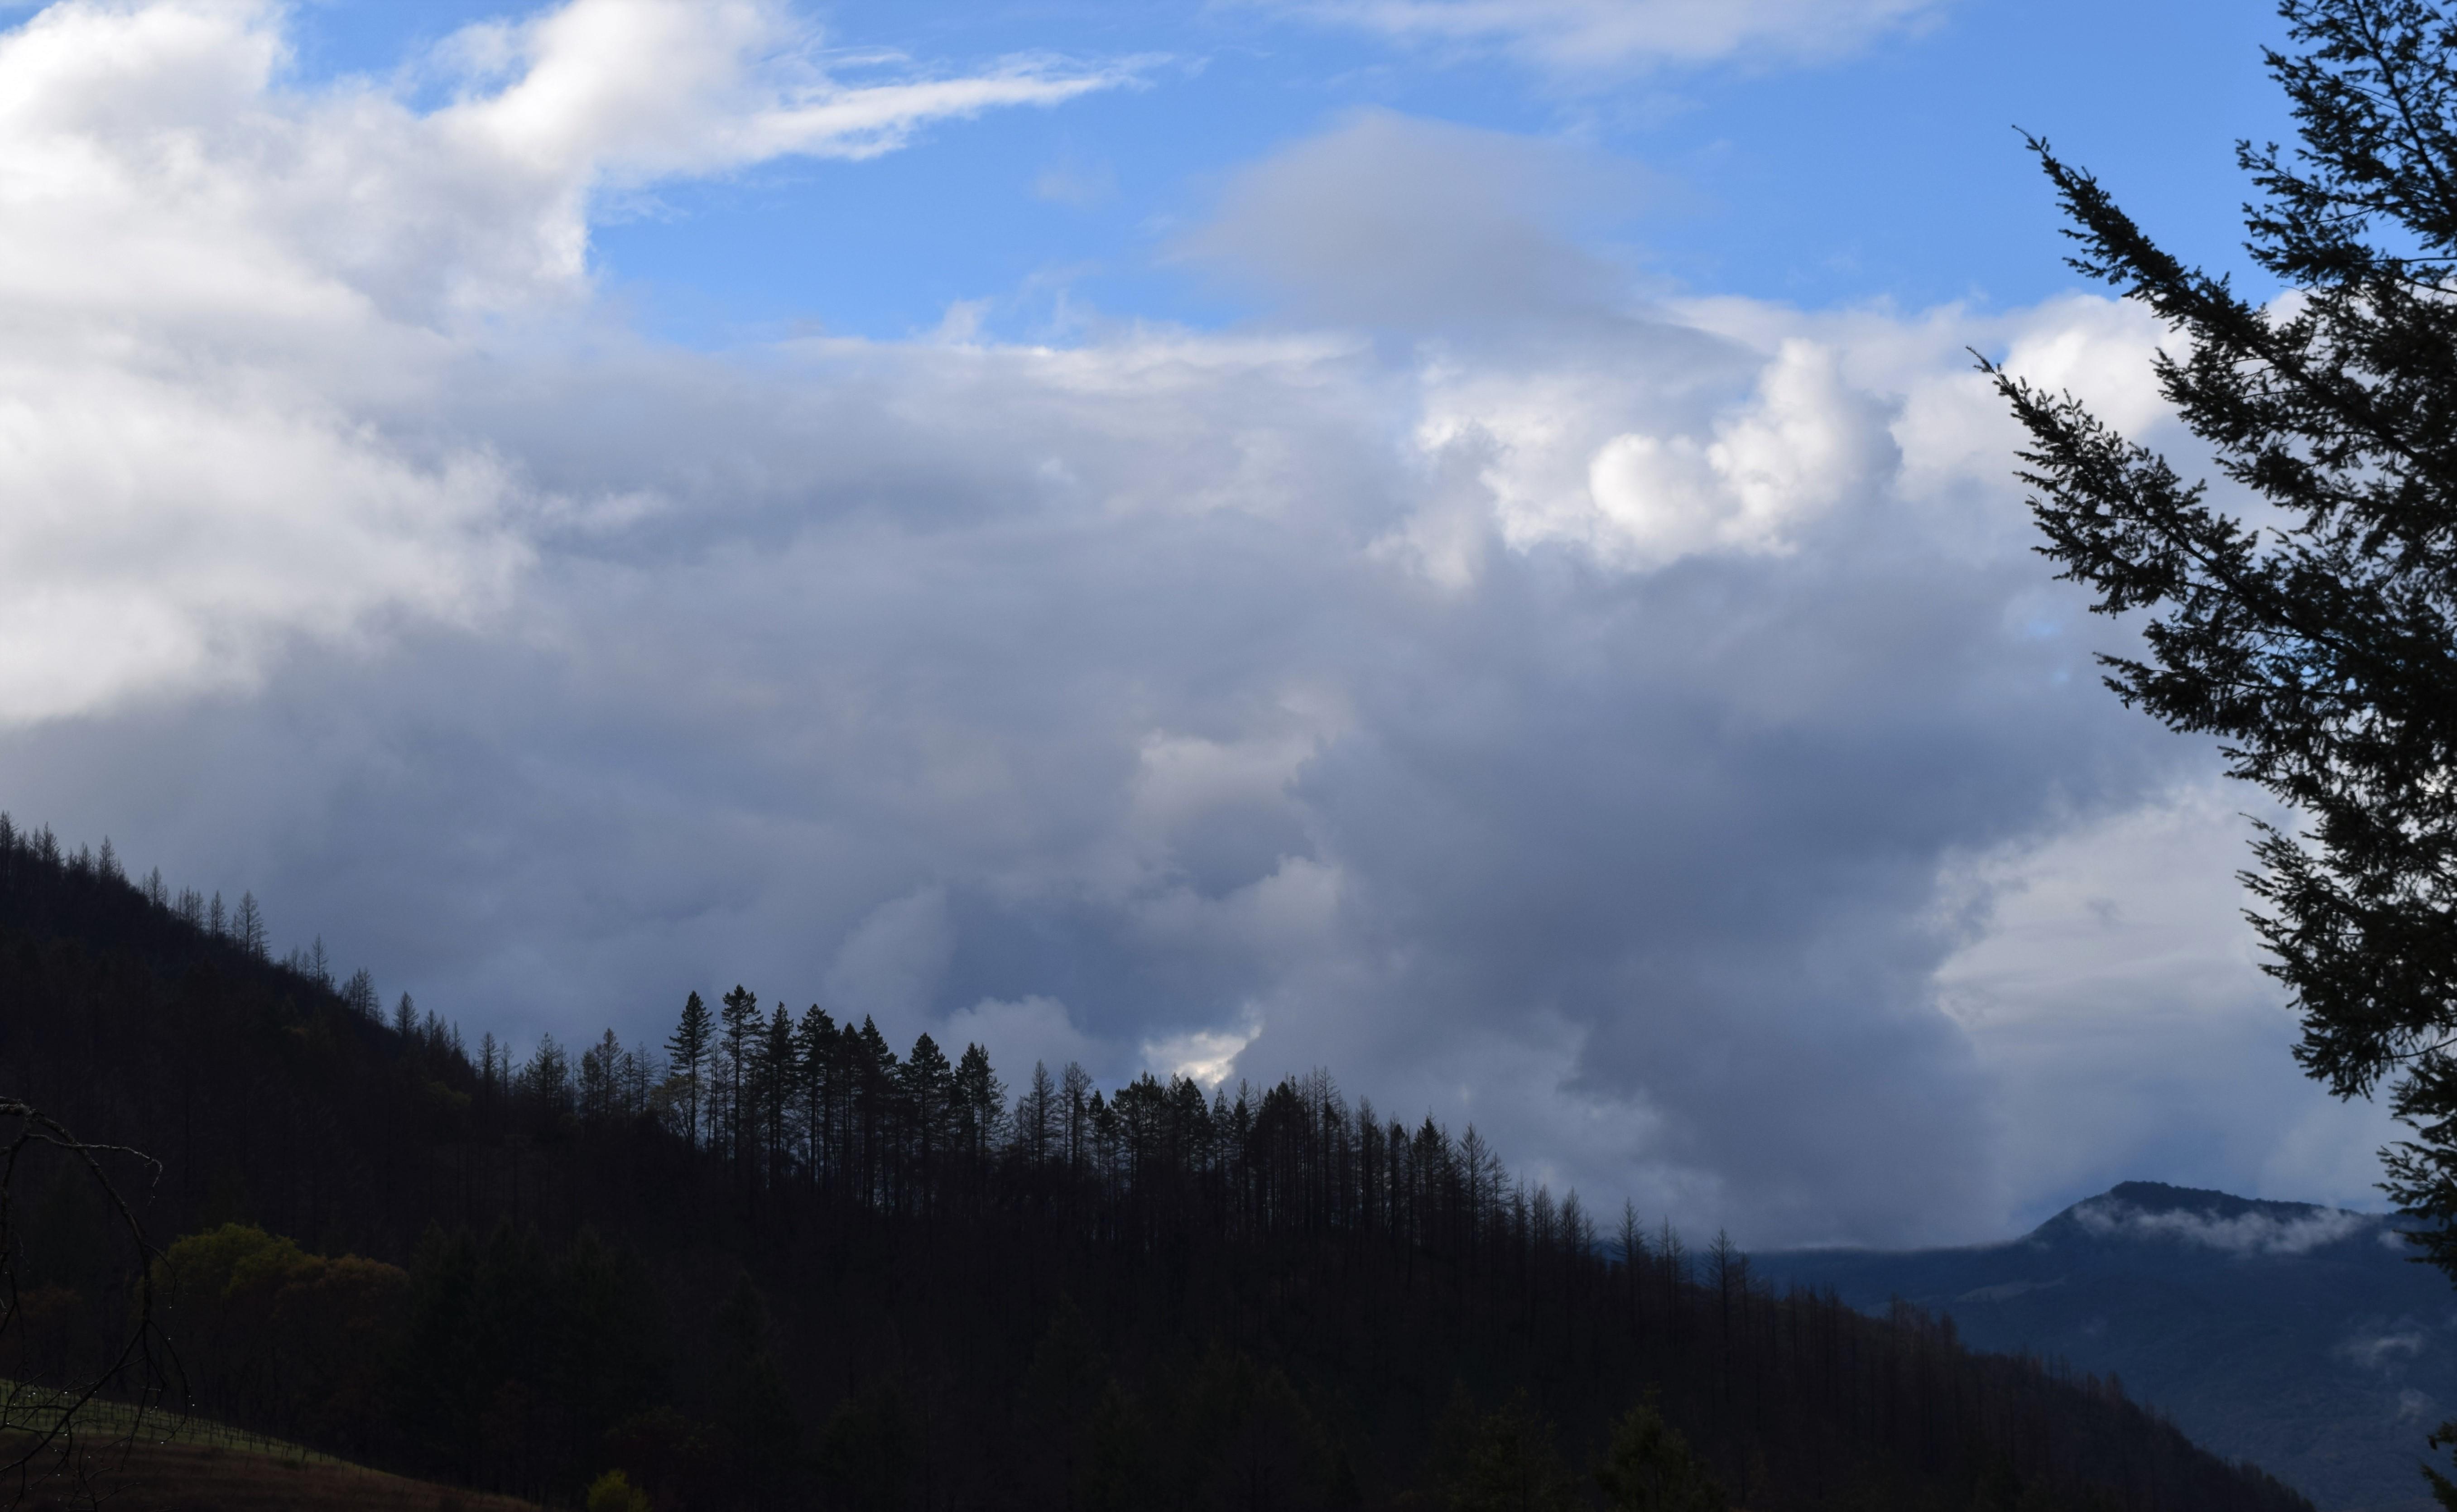 jenjoycedesign© weathering 4.38